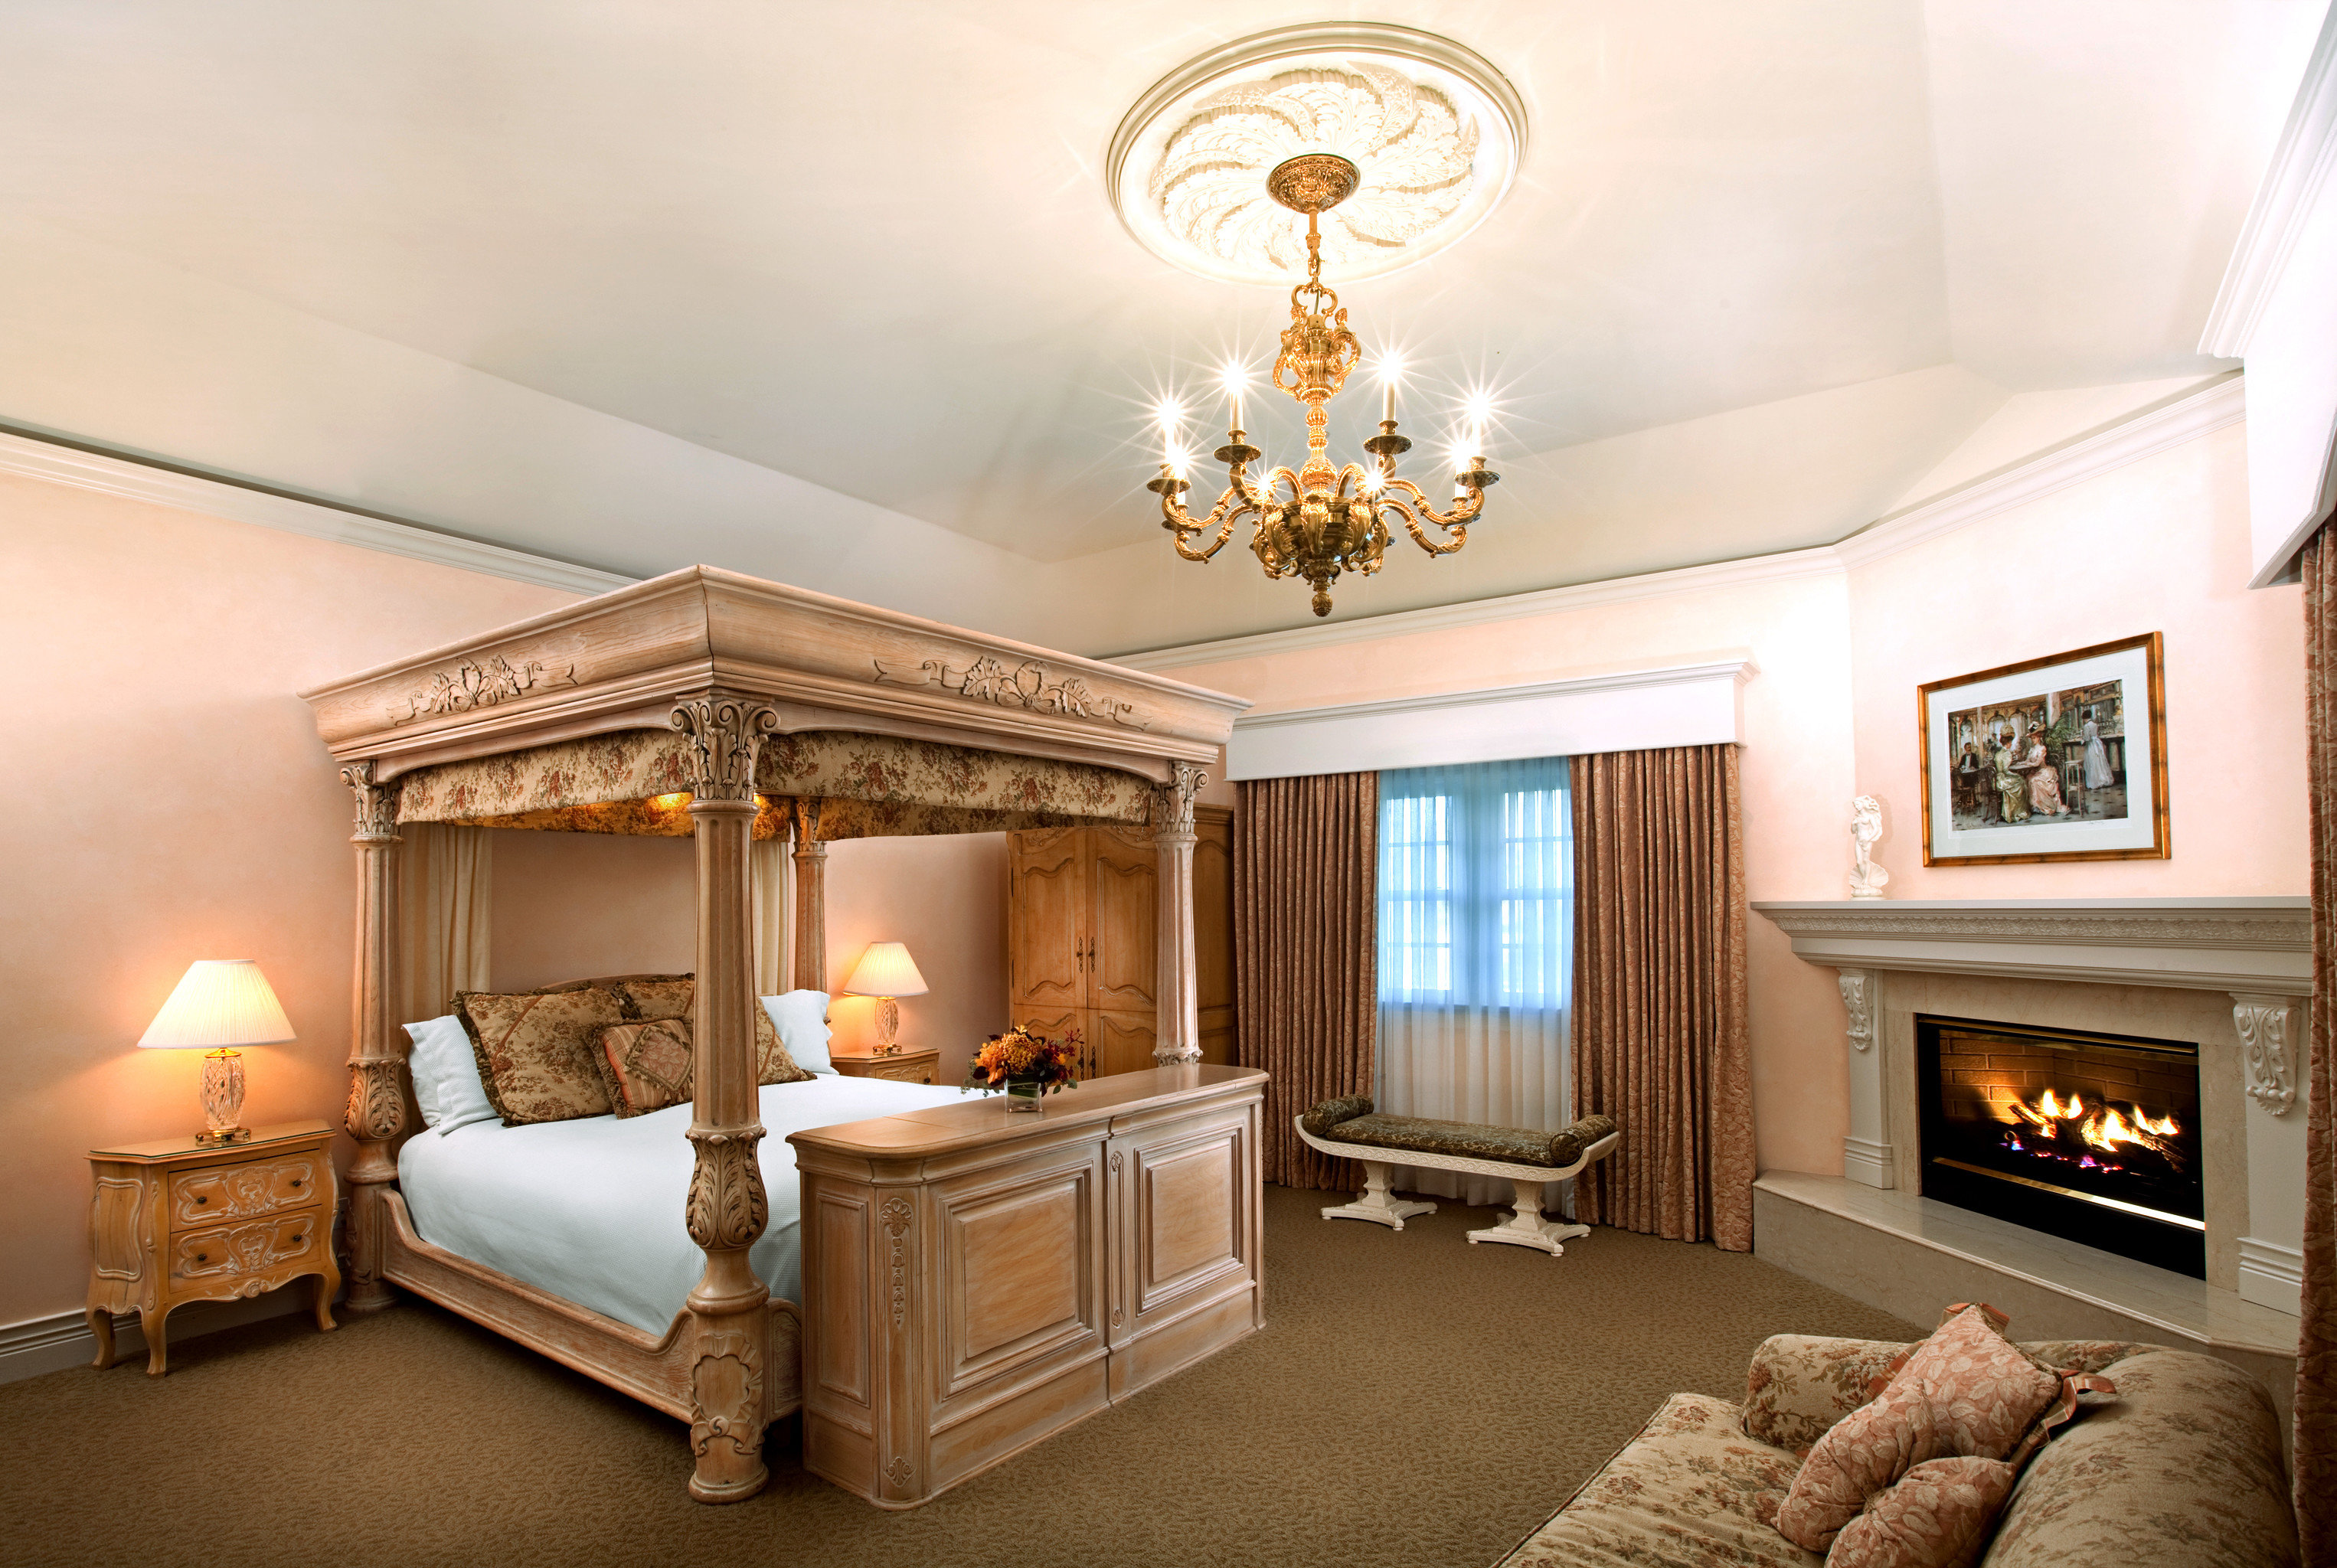 Bedroom Elegant Fireplace Historic Honeymoon Inn Romance Romantic living room property home Suite mansion cottage